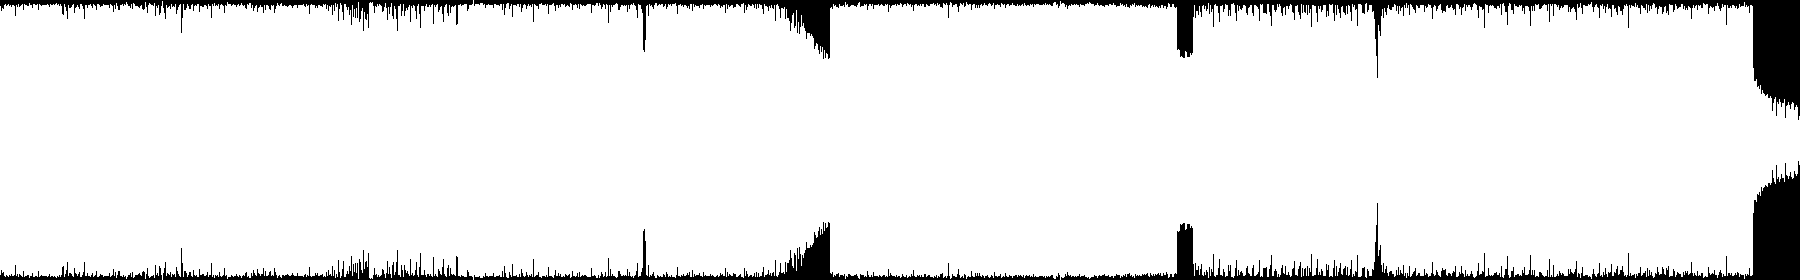 Psytrance Sounds for Sylenth audio waveform